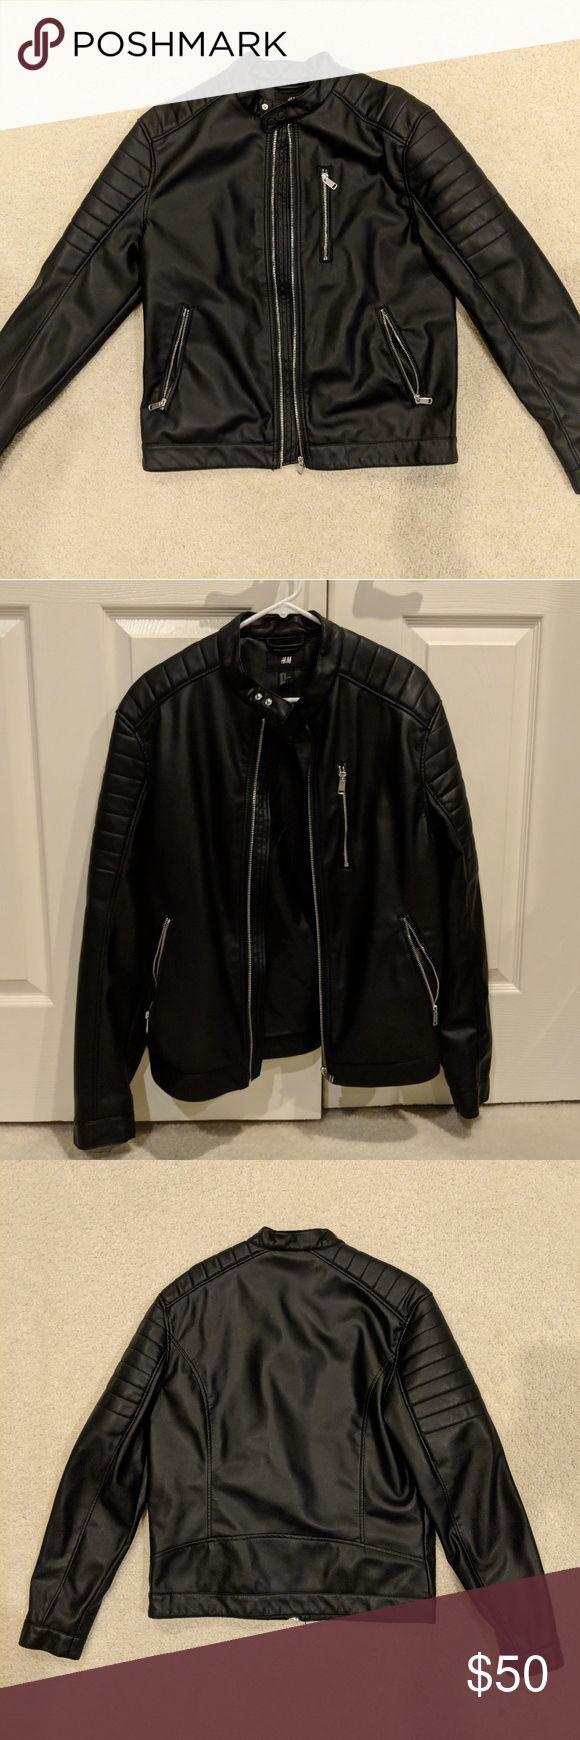 H&M leather jacket Brand New. Never Worn. Medium men's